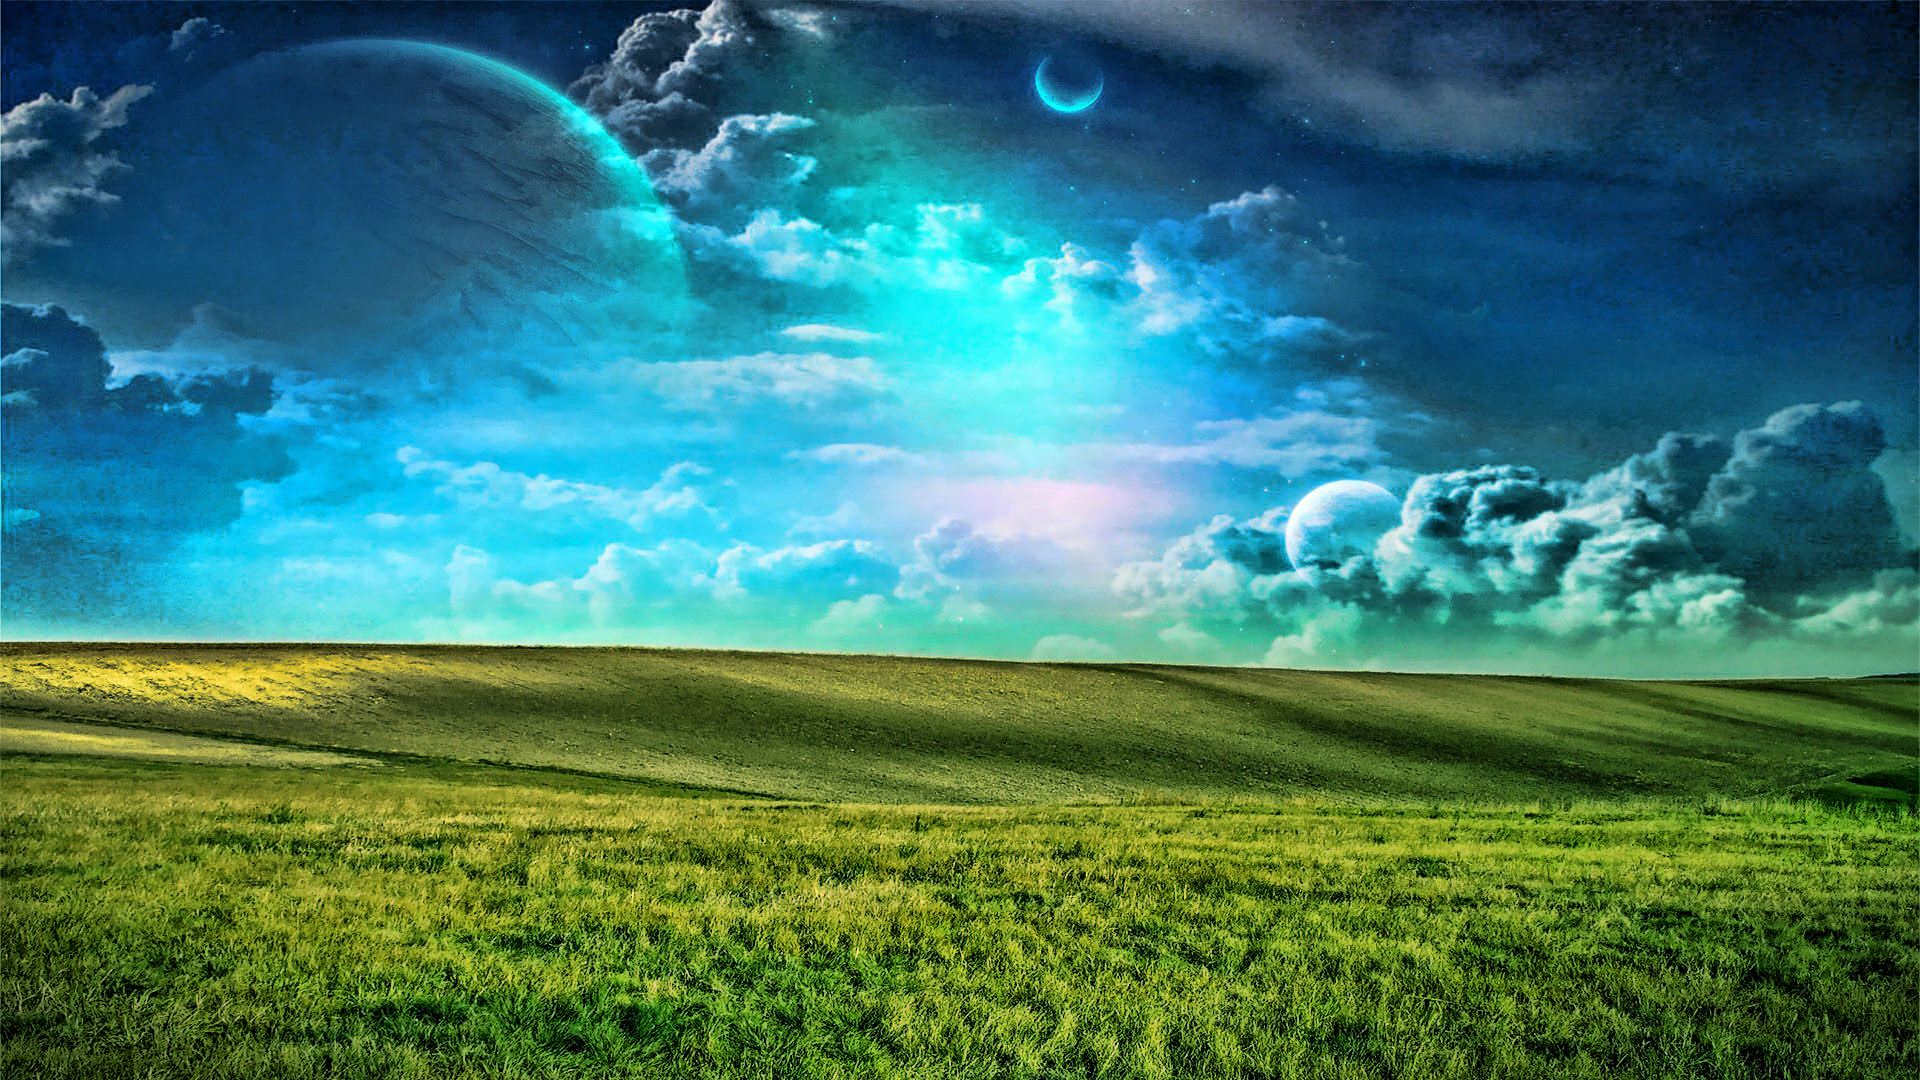 Sfondi paesaggi hd 75 immagini for Immagini hd desktop